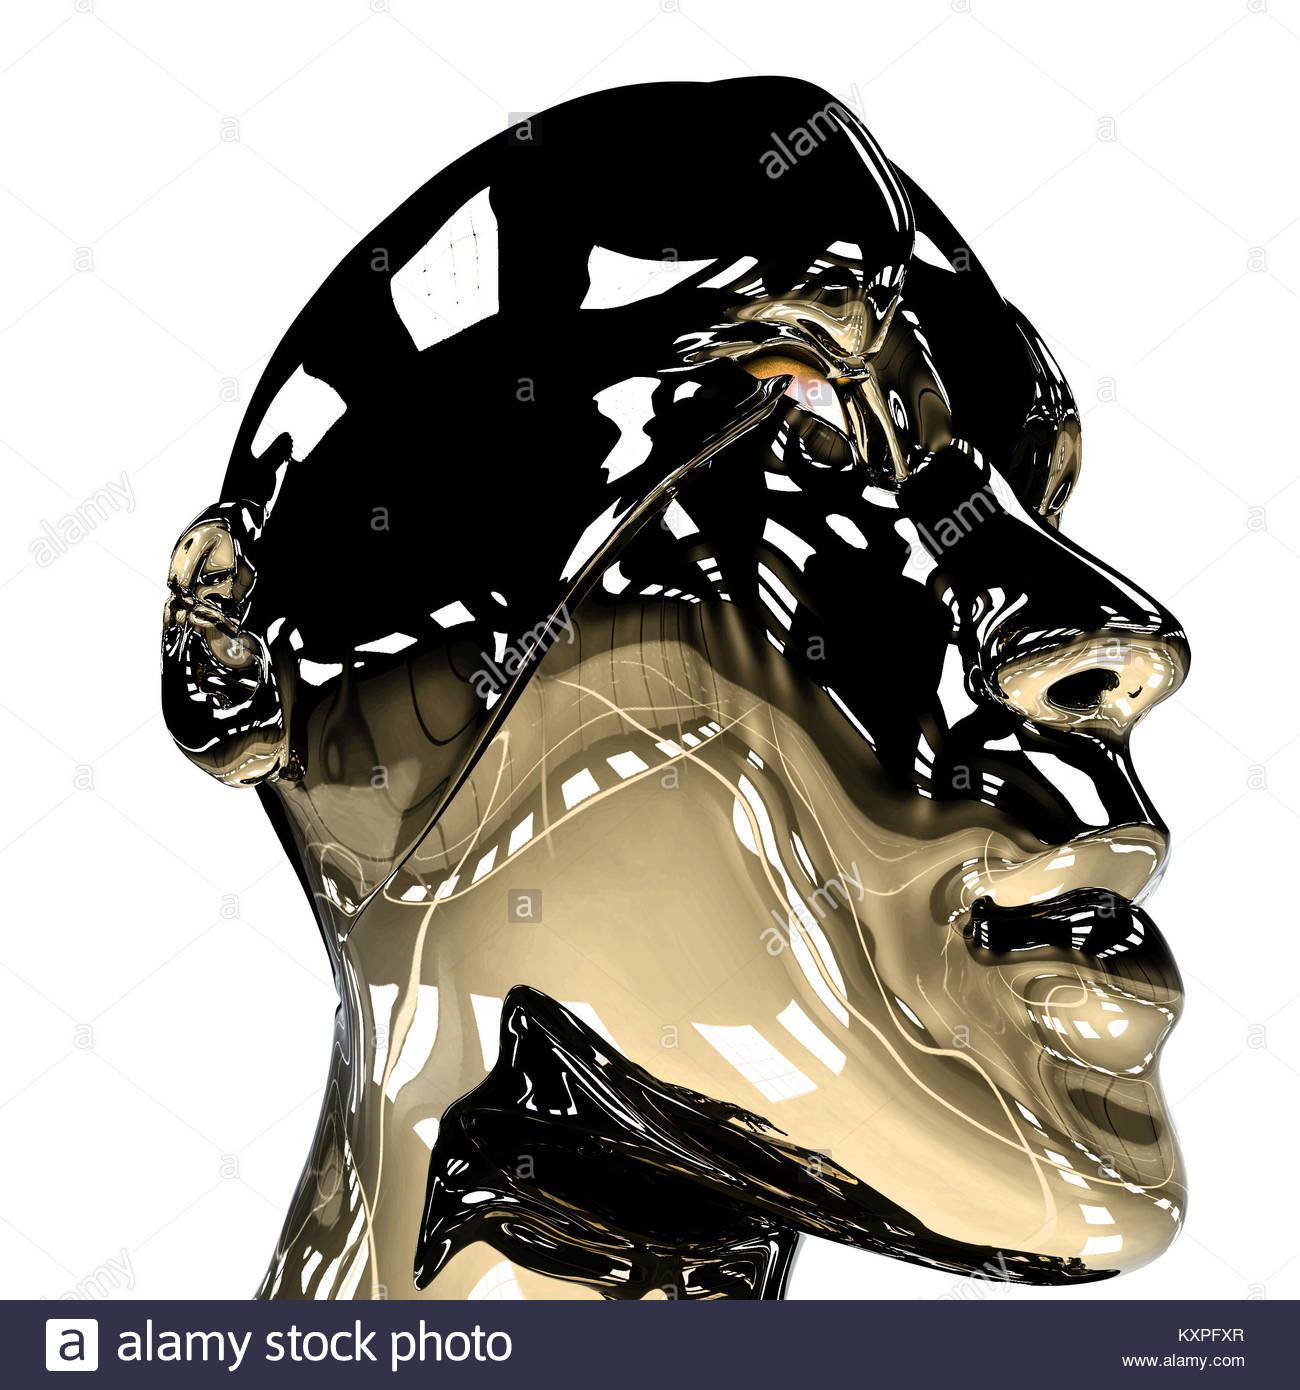 Android Robot Cyborg Ai Thinking Stock Photo 171369823 Alamy